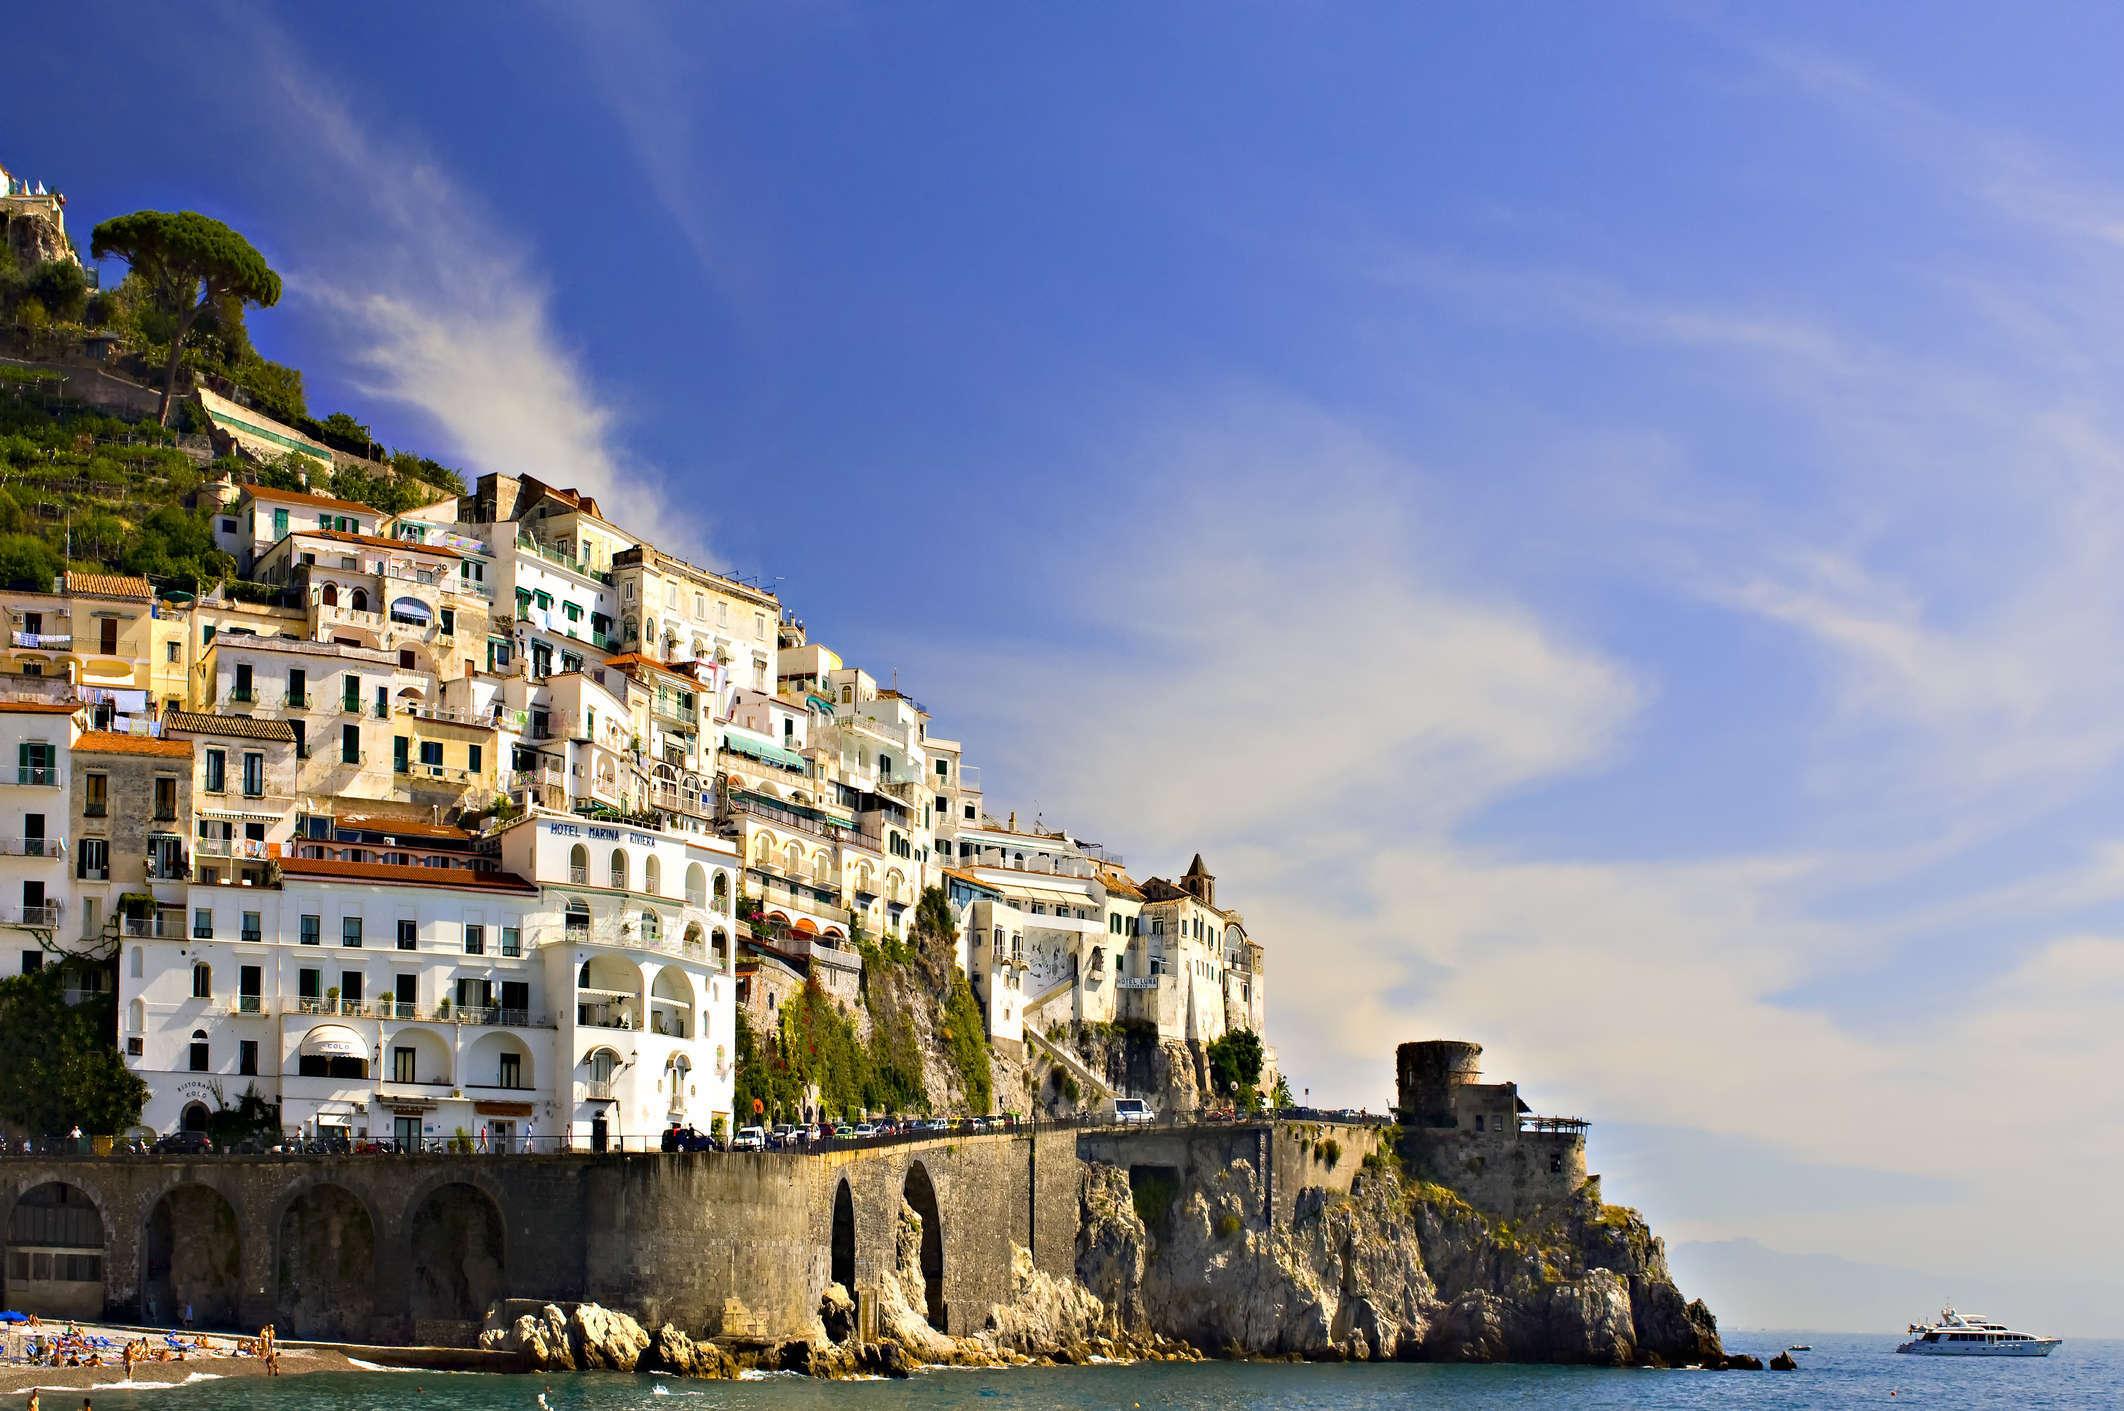 6 giorno: Ravello - Amalfi - Positano - Napoli